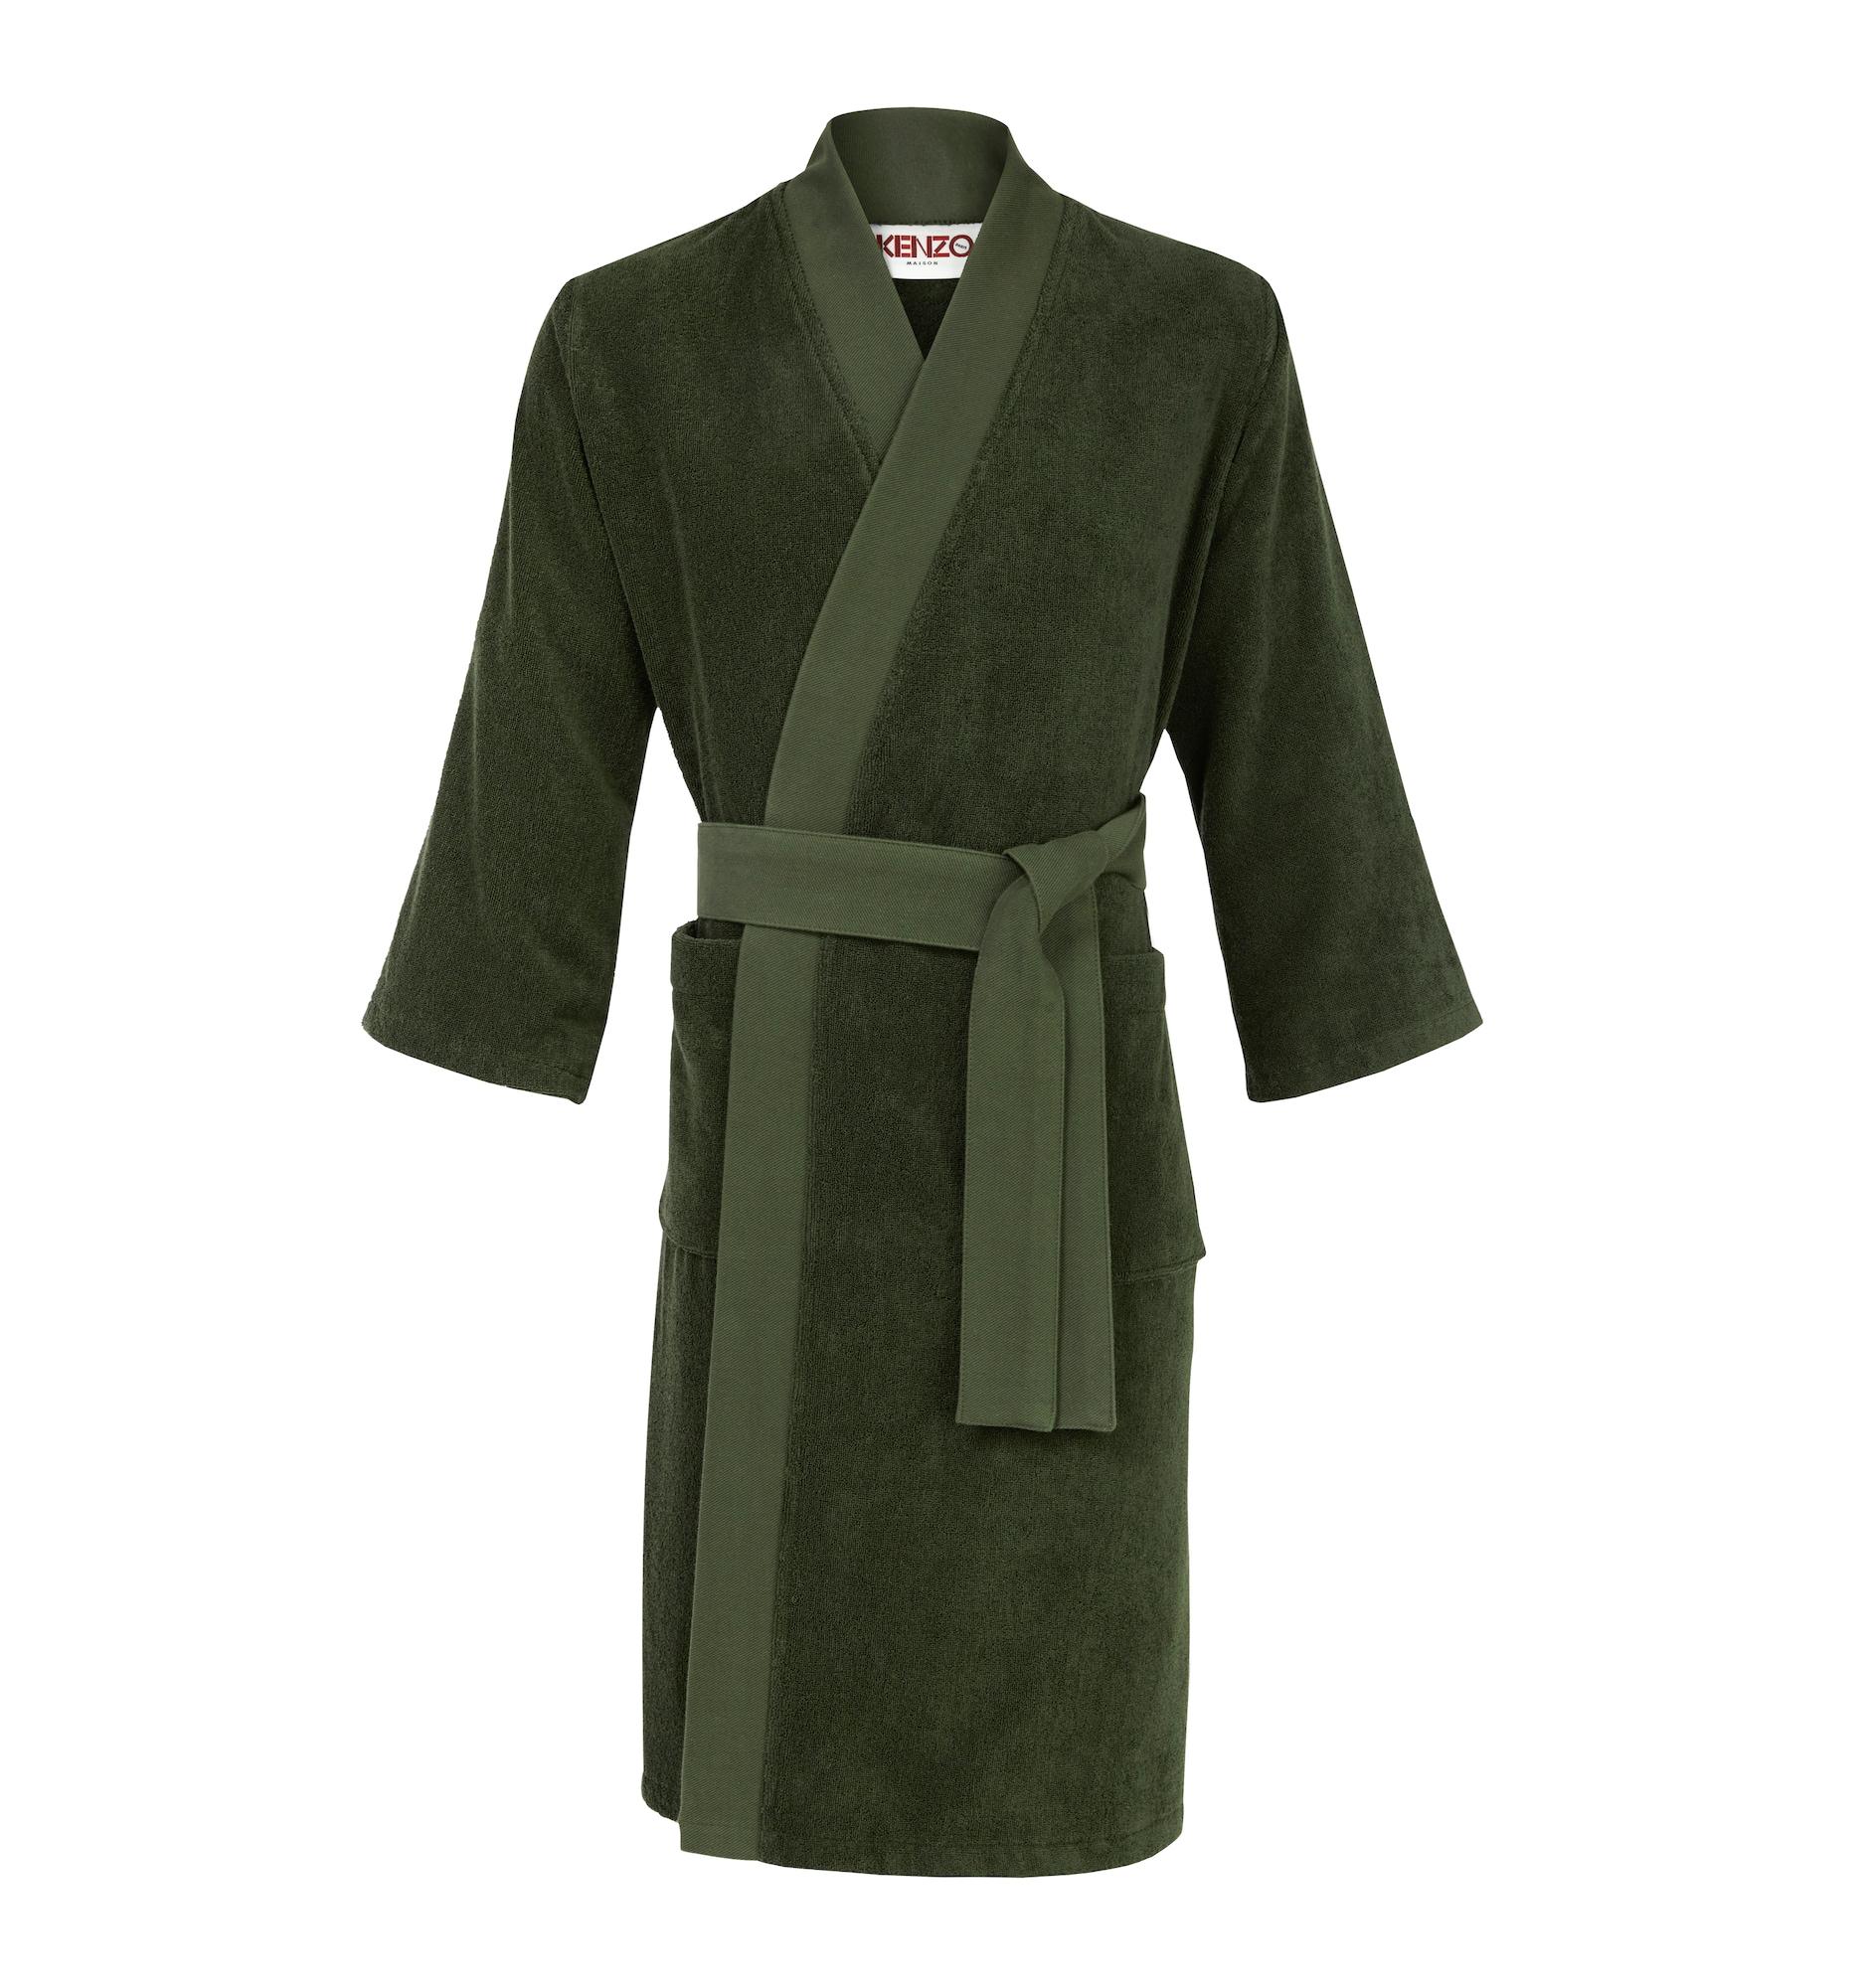 Herren Kenzo Maison Bademantel 'ICONIC' grün,  khaki,  olive | 03152208883453